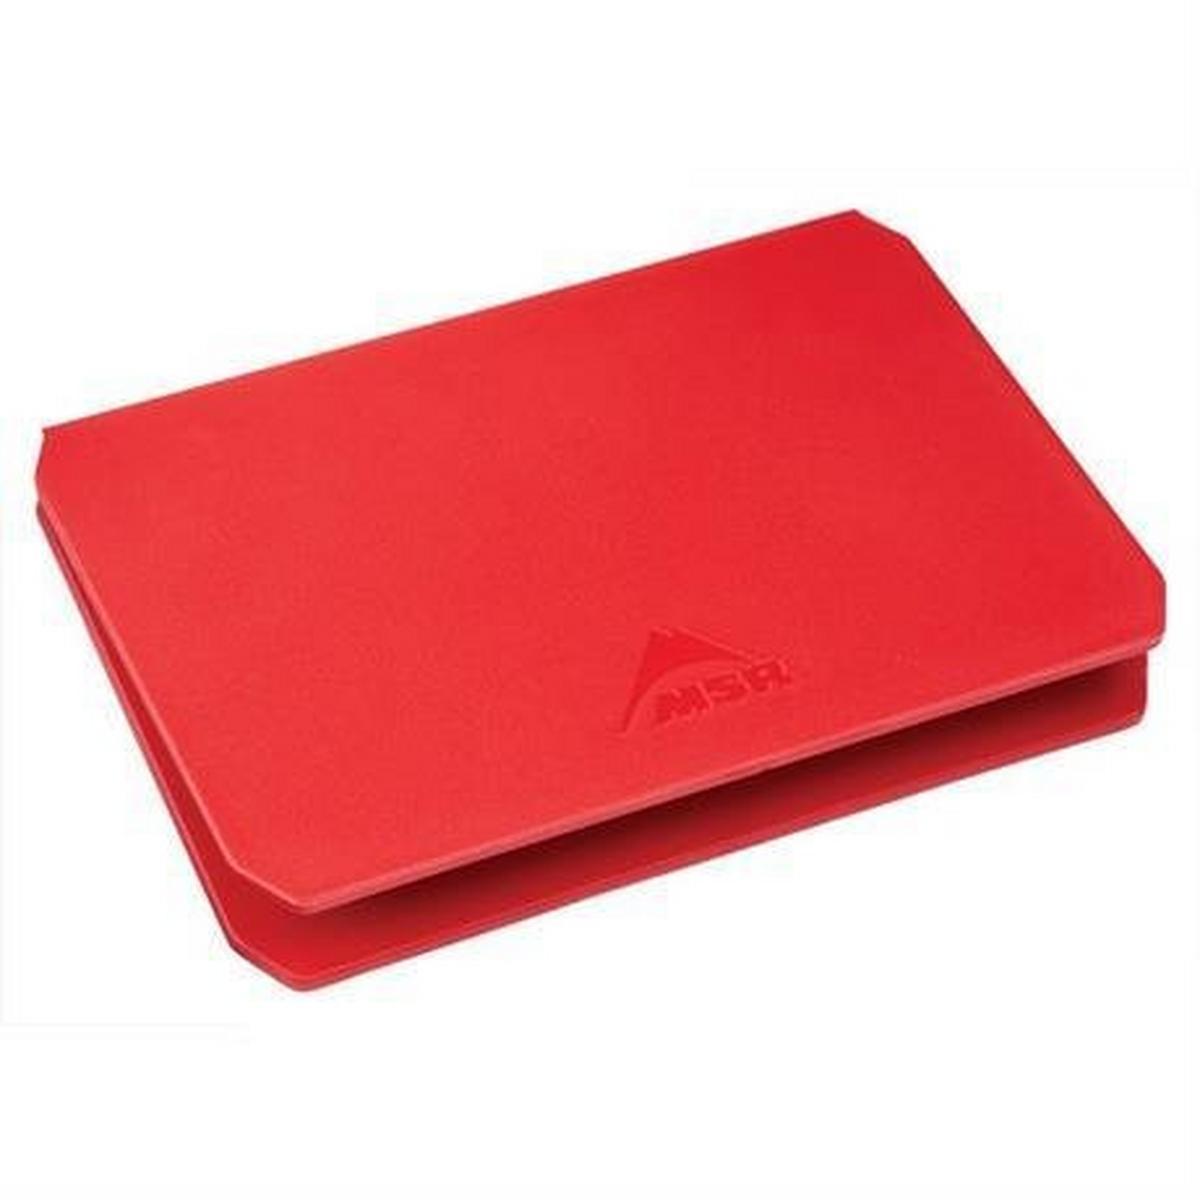 M.s.r. MSR Alpine Deluxe Cutting Board Red